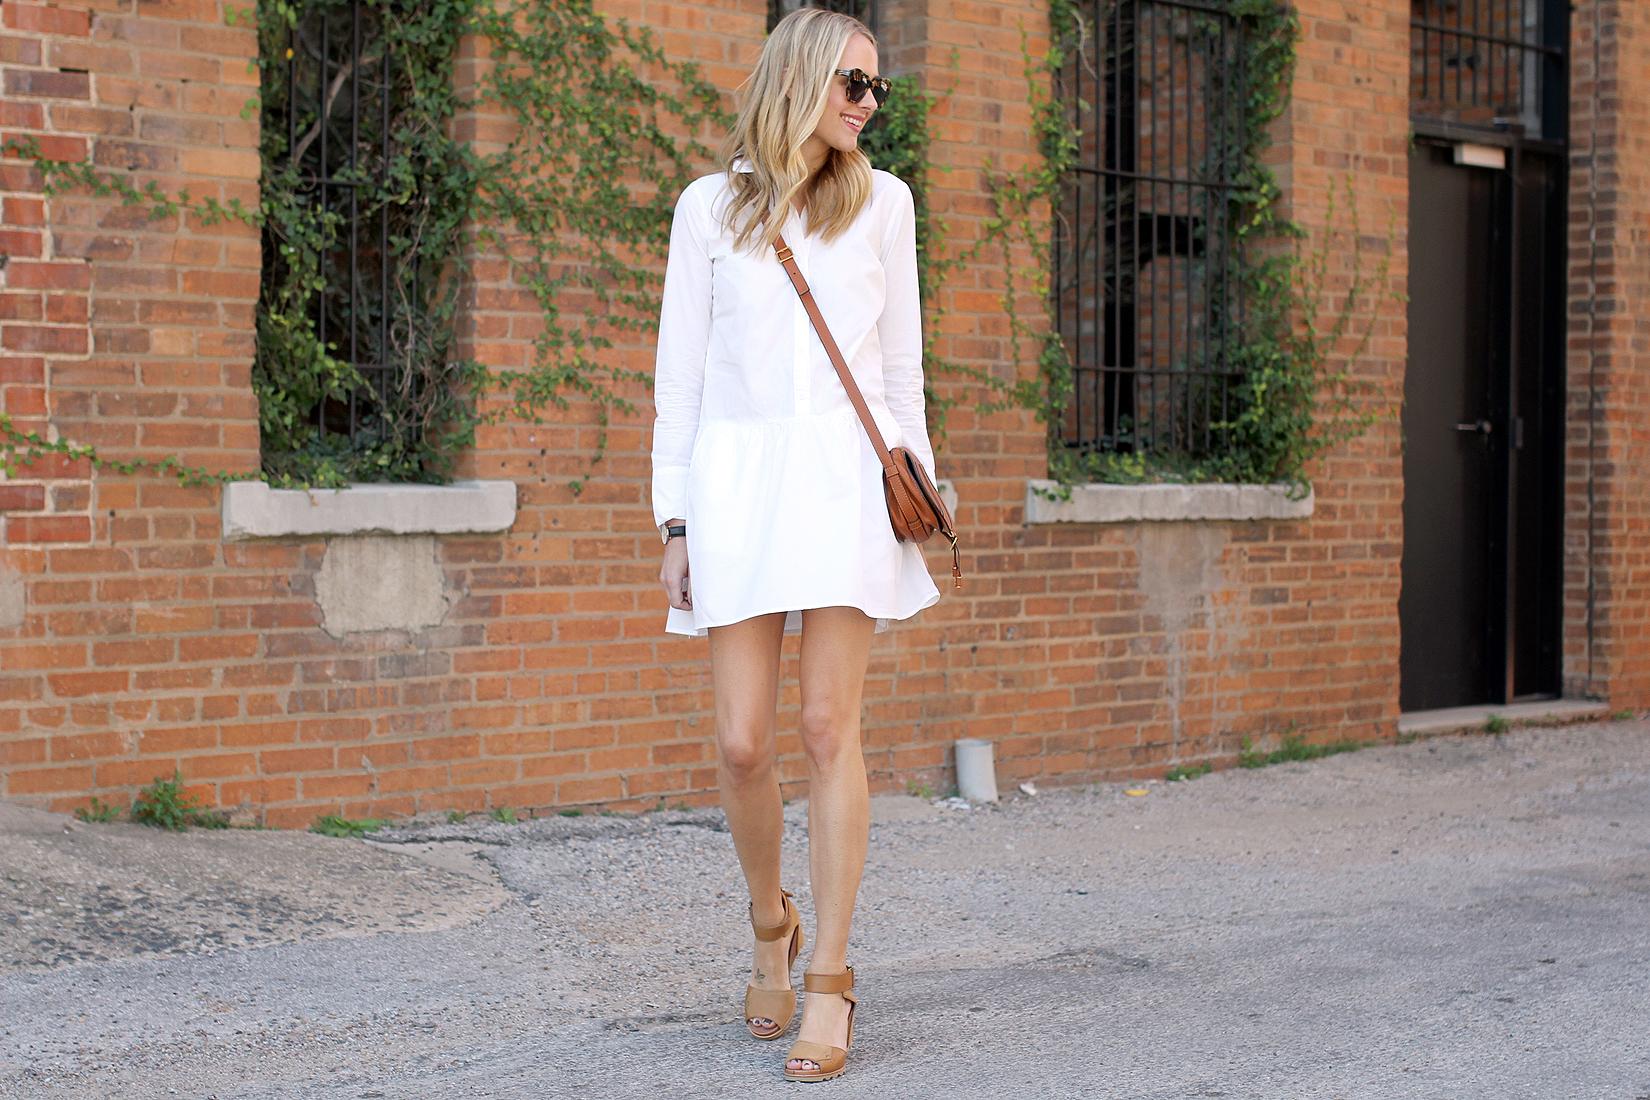 fashion-jackson-sorel-joanie-sandals-splendid-damsel-white-shirt-dress-karen-walker-sunglasses-chloe-marcie-tan-crossbody